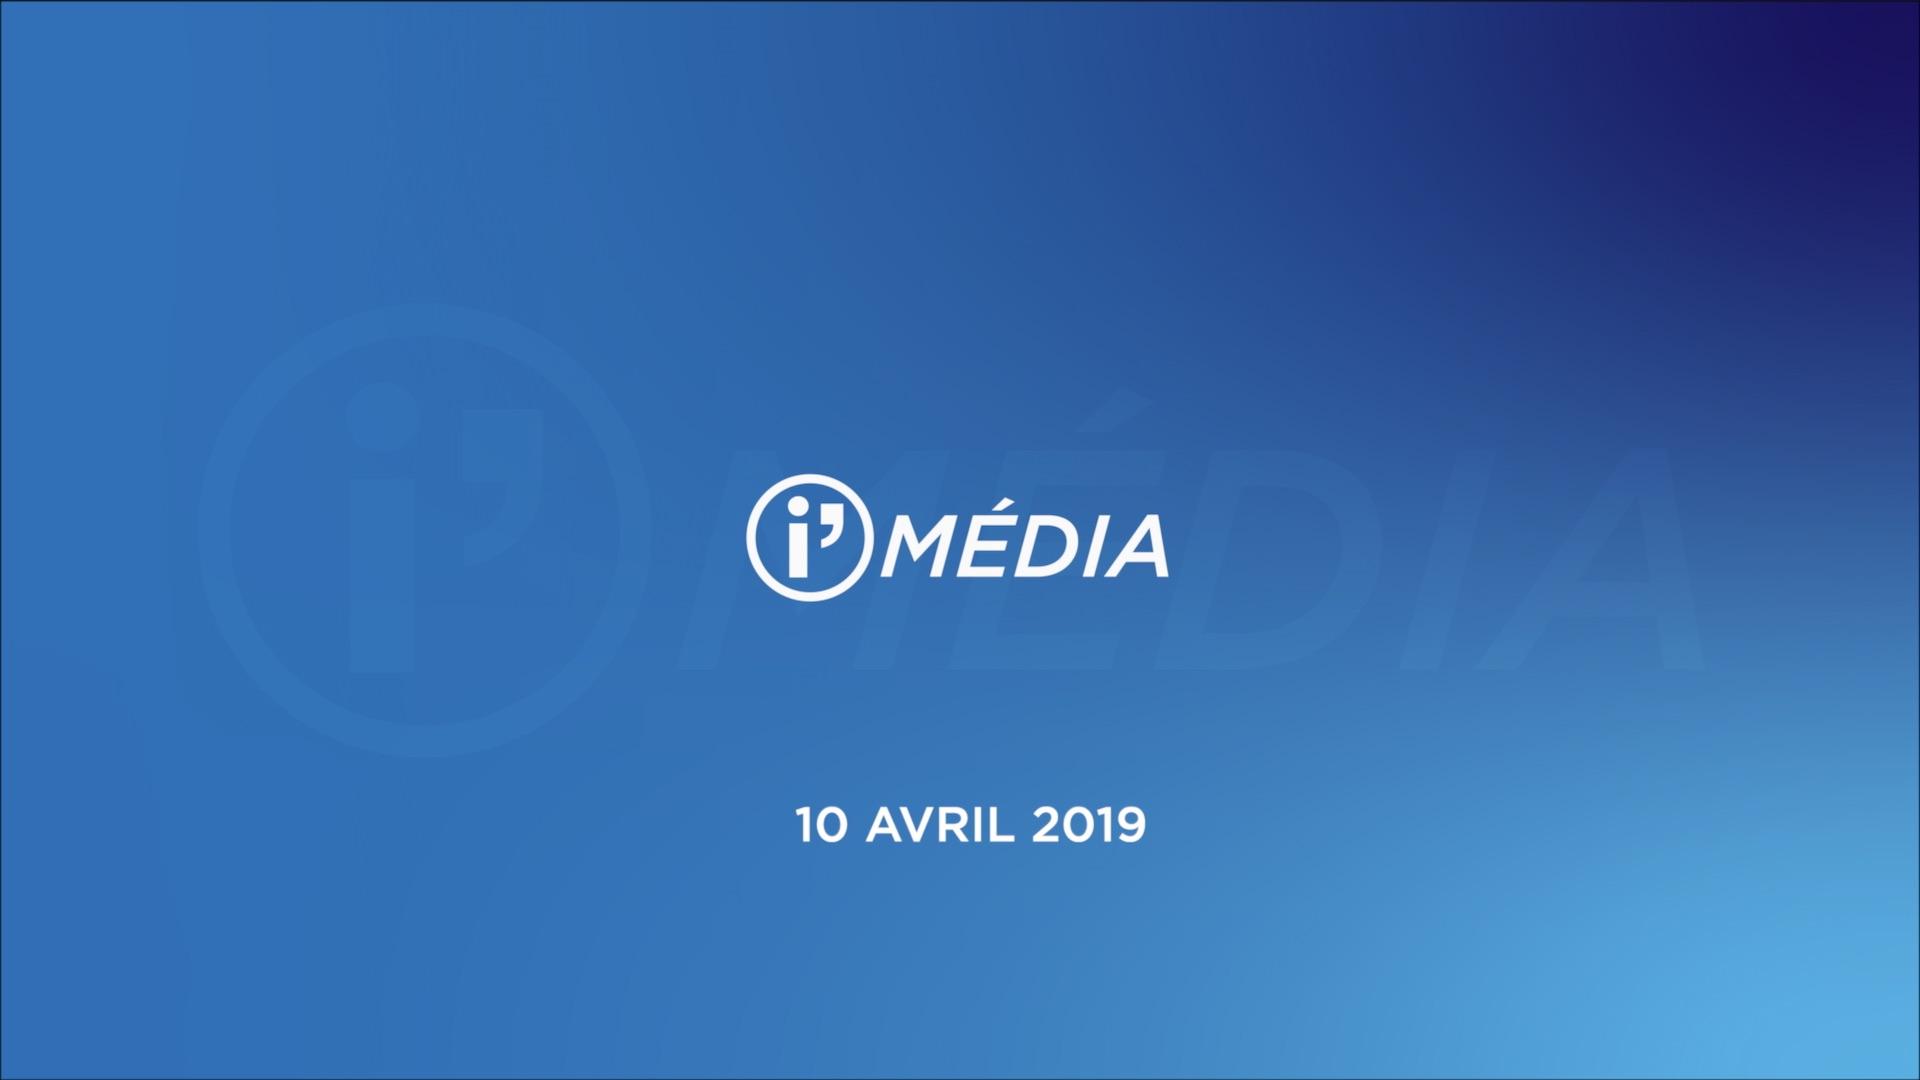 I'Média 10 avril 2019